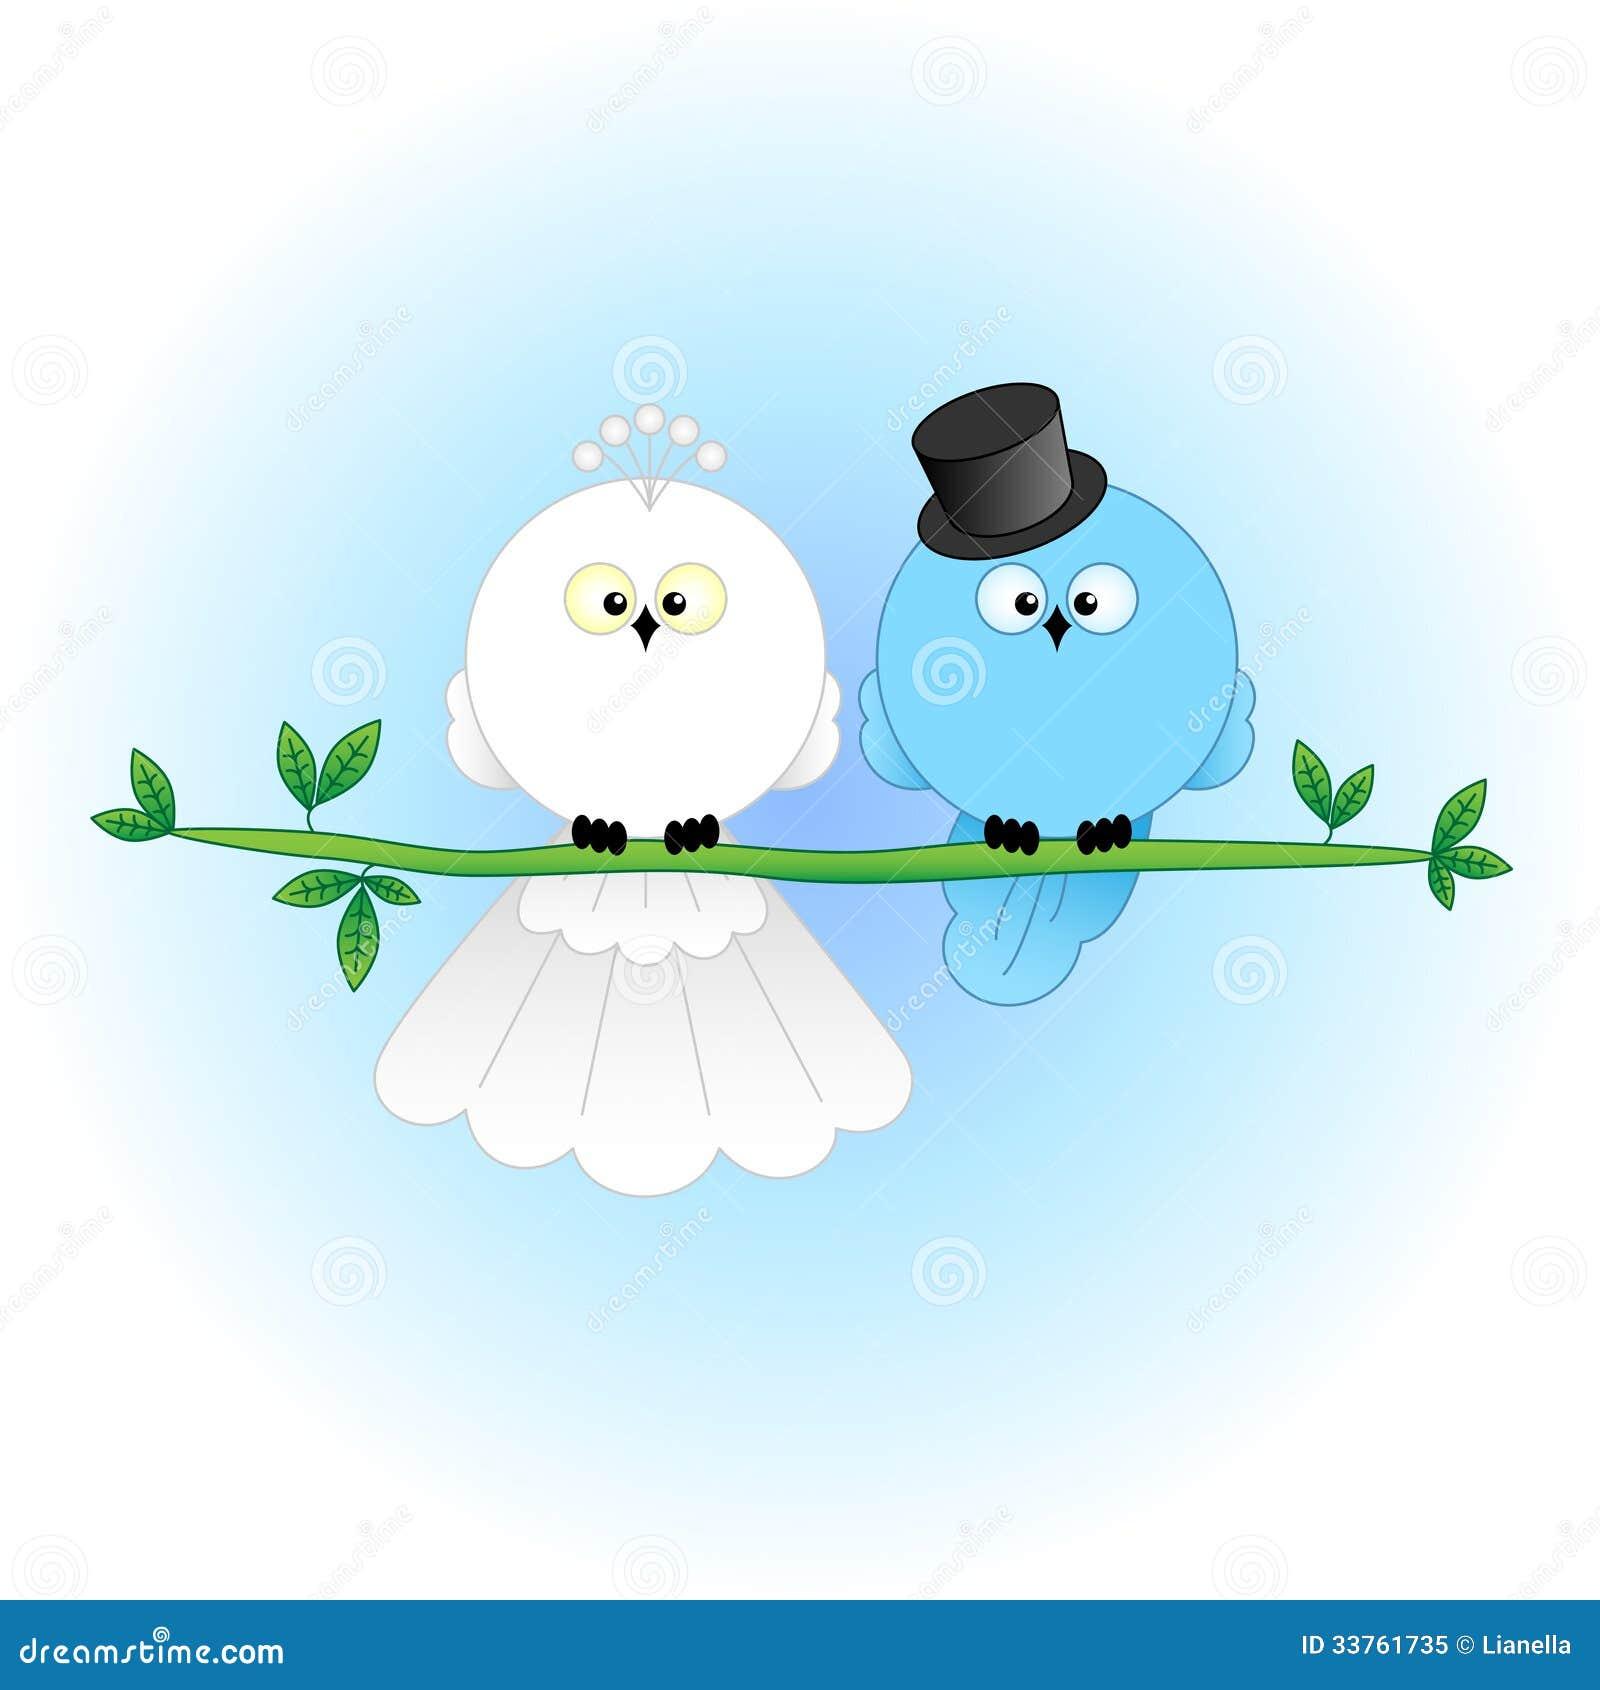 Stylish Bride And Groom Birds Royalty Free Stock Photo - Image: 33761735